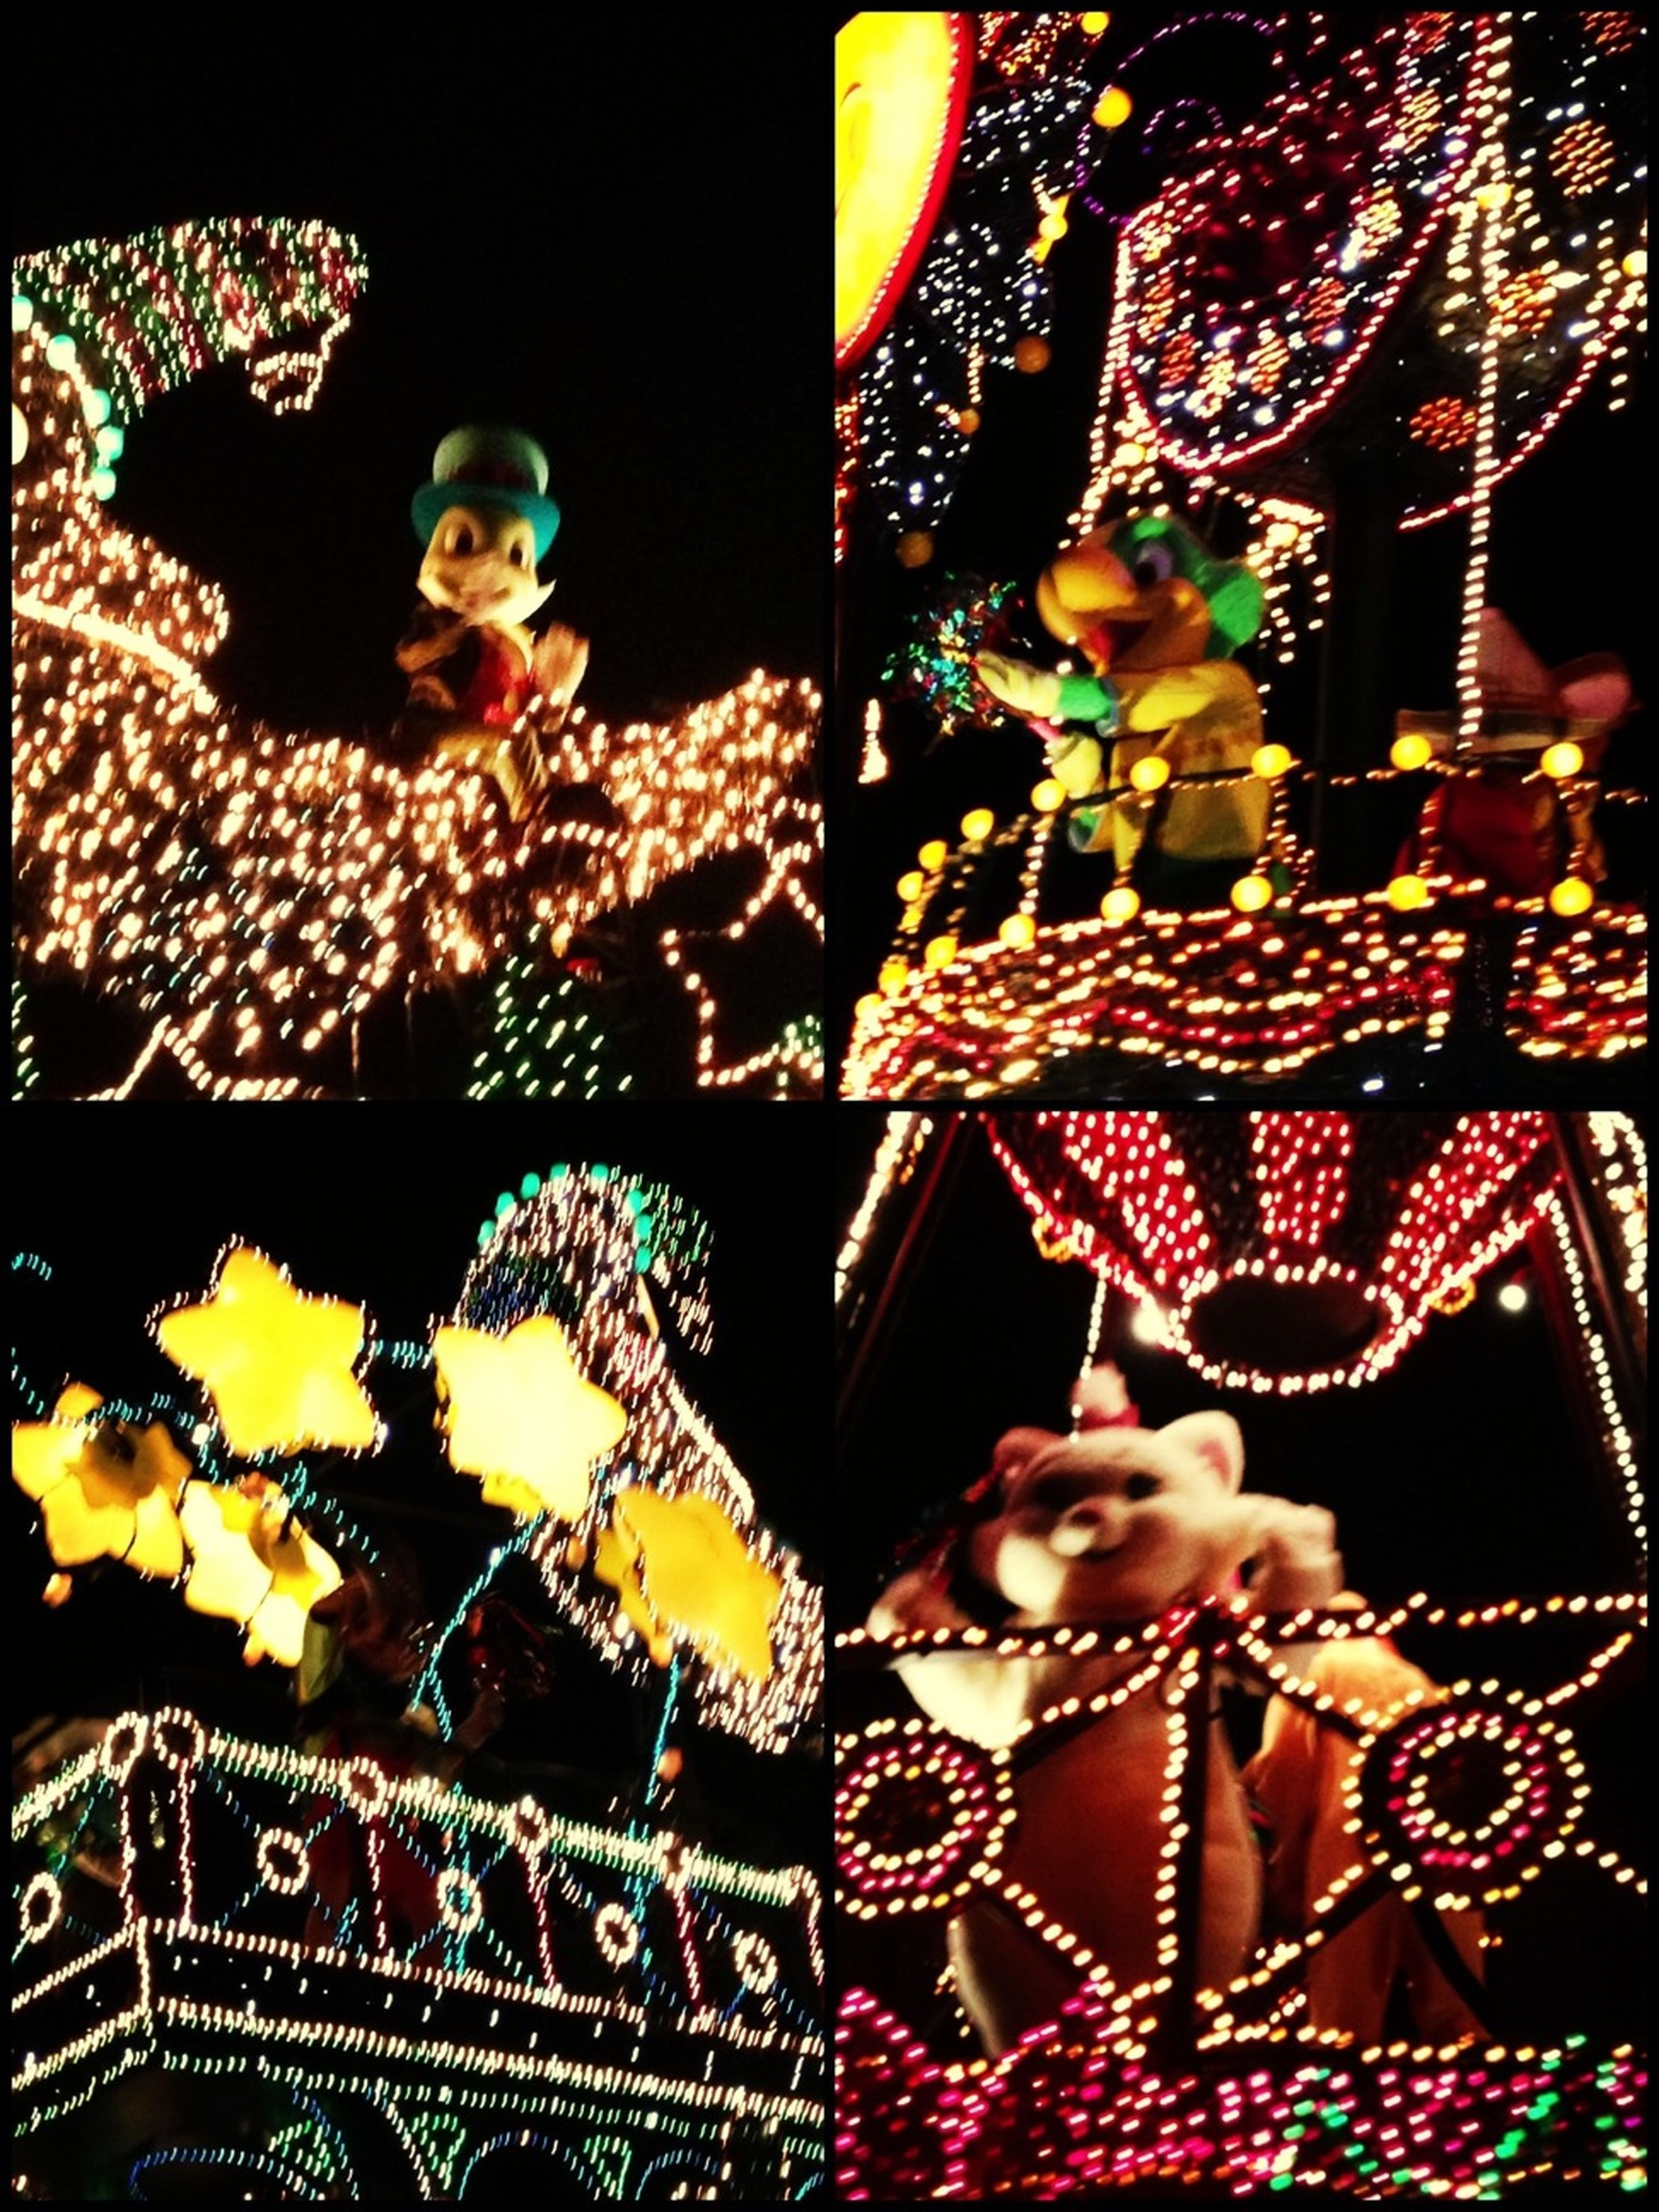 indoors, night, art and craft, art, creativity, tradition, human representation, illuminated, cultures, animal representation, decoration, statue, low angle view, christmas, celebration, portrait, christmas decoration, religion